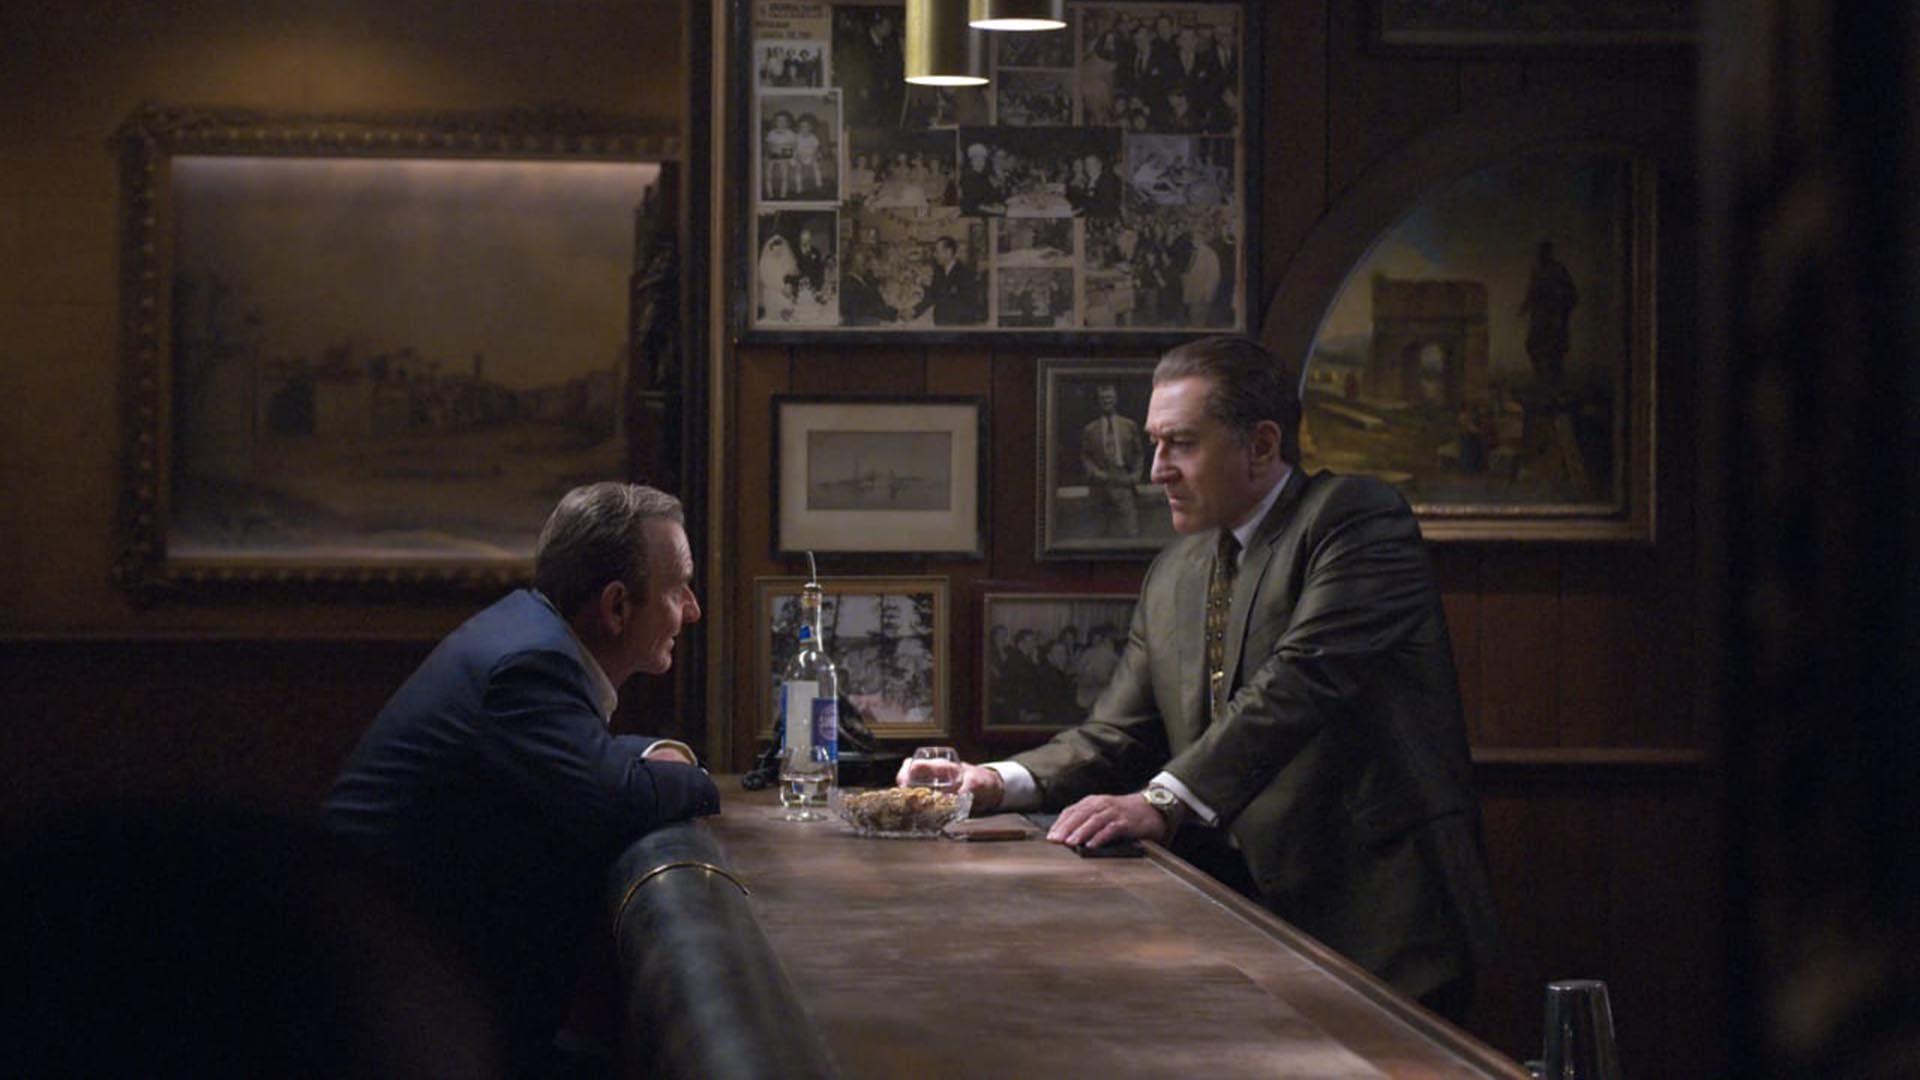 Joe Pesci vuelve a interpretar a un mafioso en el film de Martin Scorsese